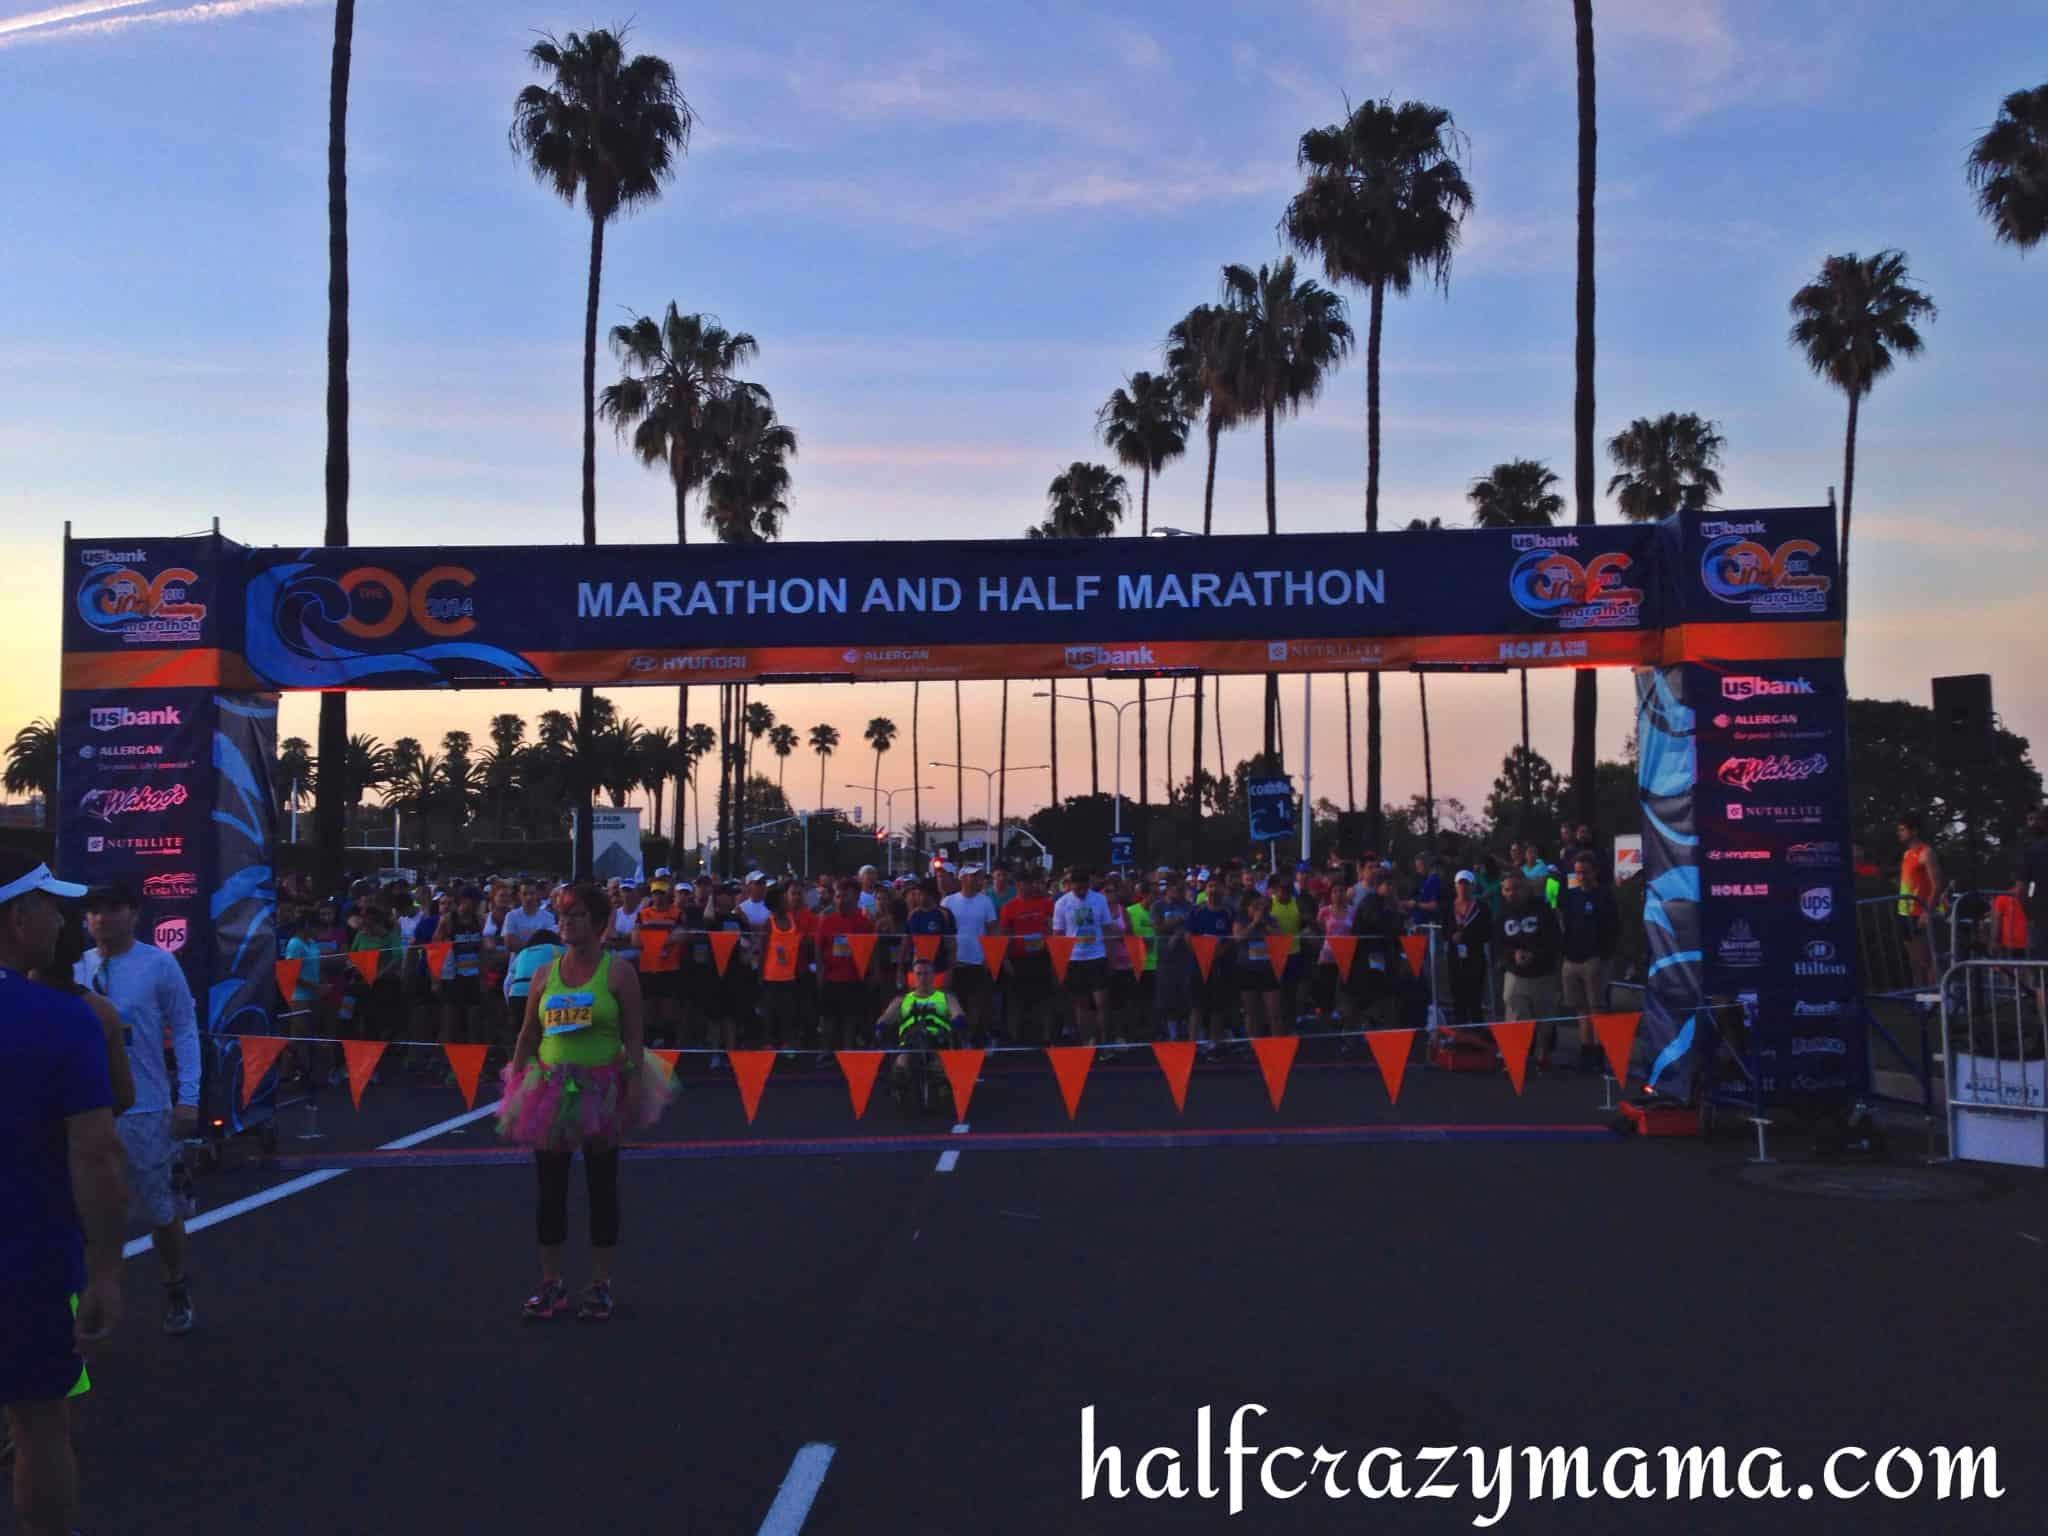 Tinkerbell half marathon coupon code 2018